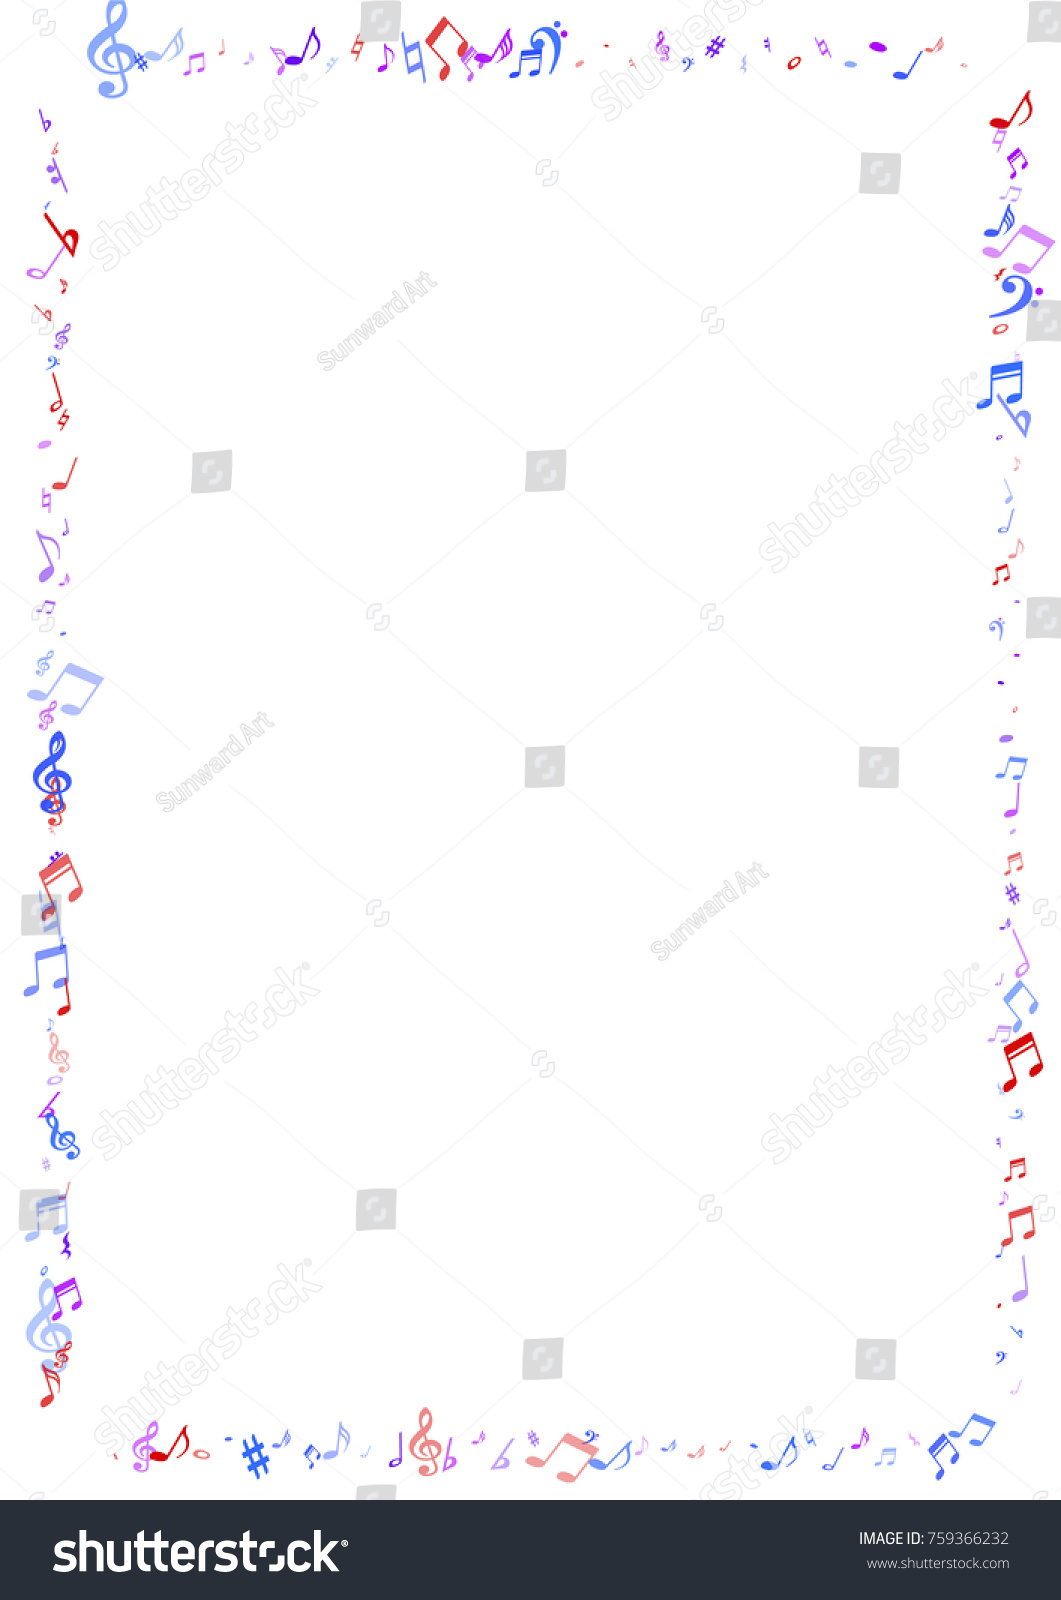 Colorful Musical Notes Flying Border Isolated Stock-Vektorgrafik ...